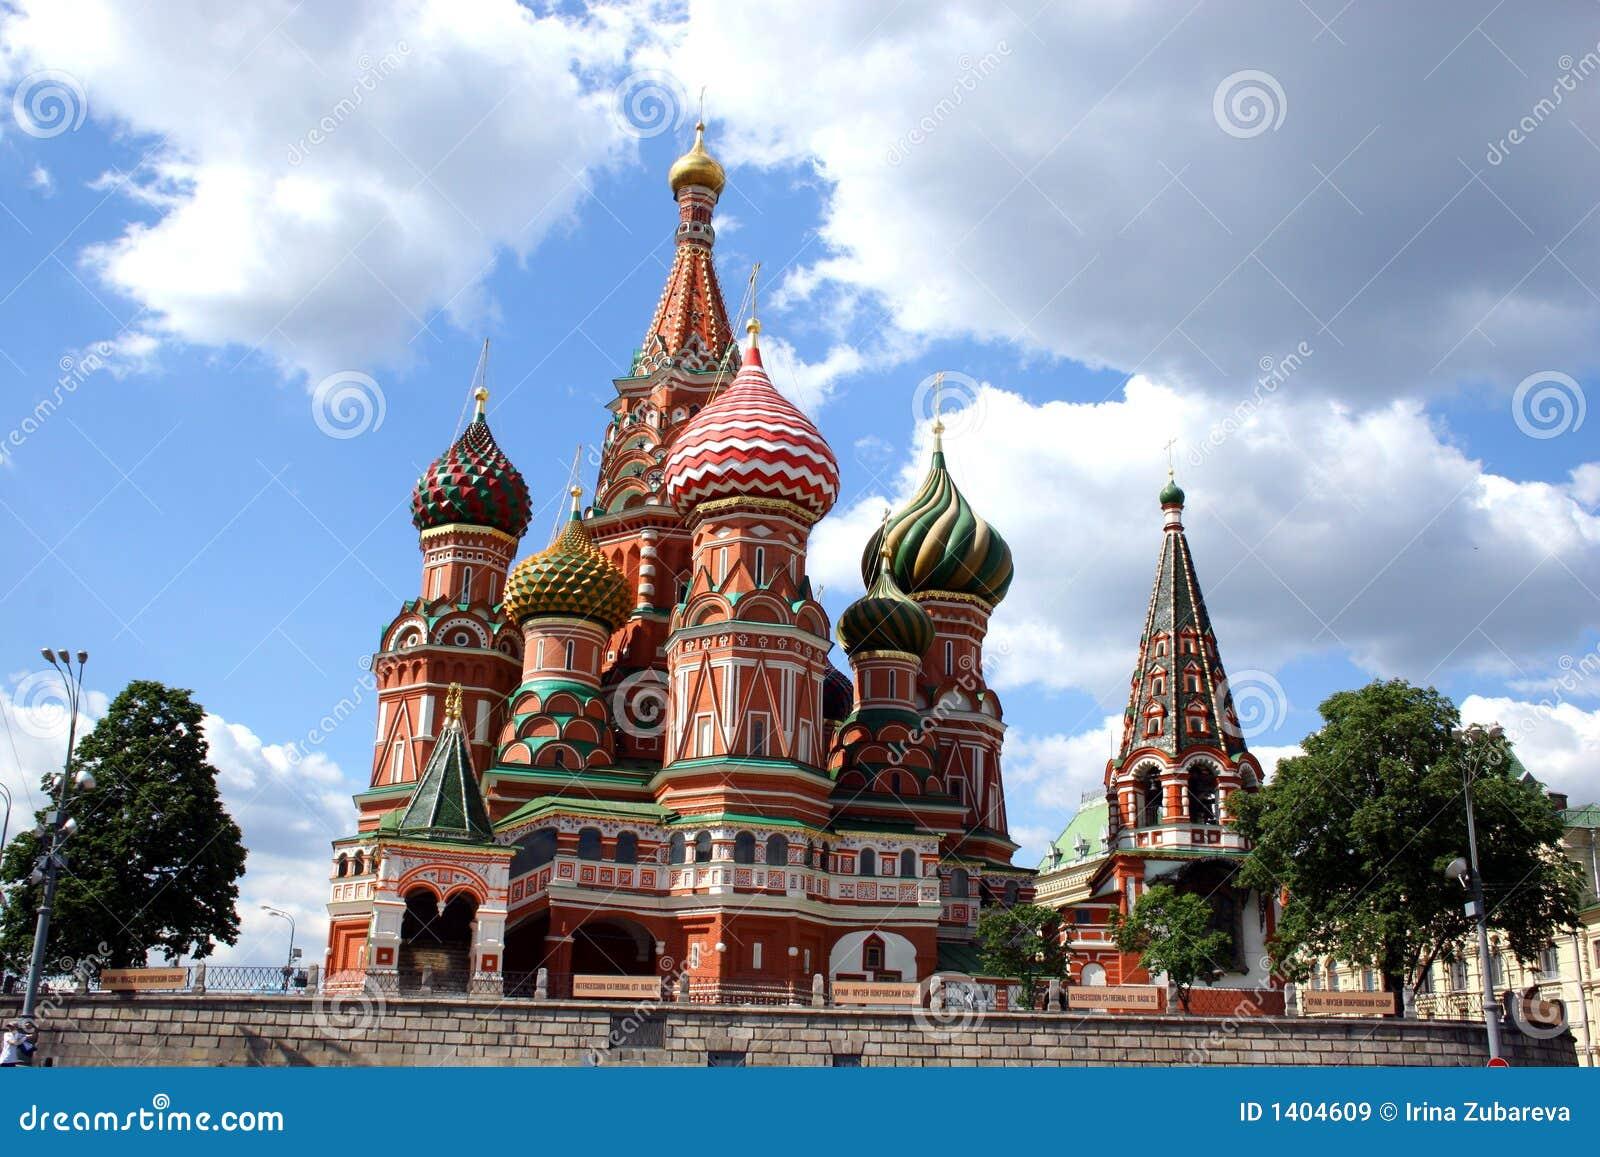 Cathédrale de Vasily Blazhennyj sur la zone rouge.